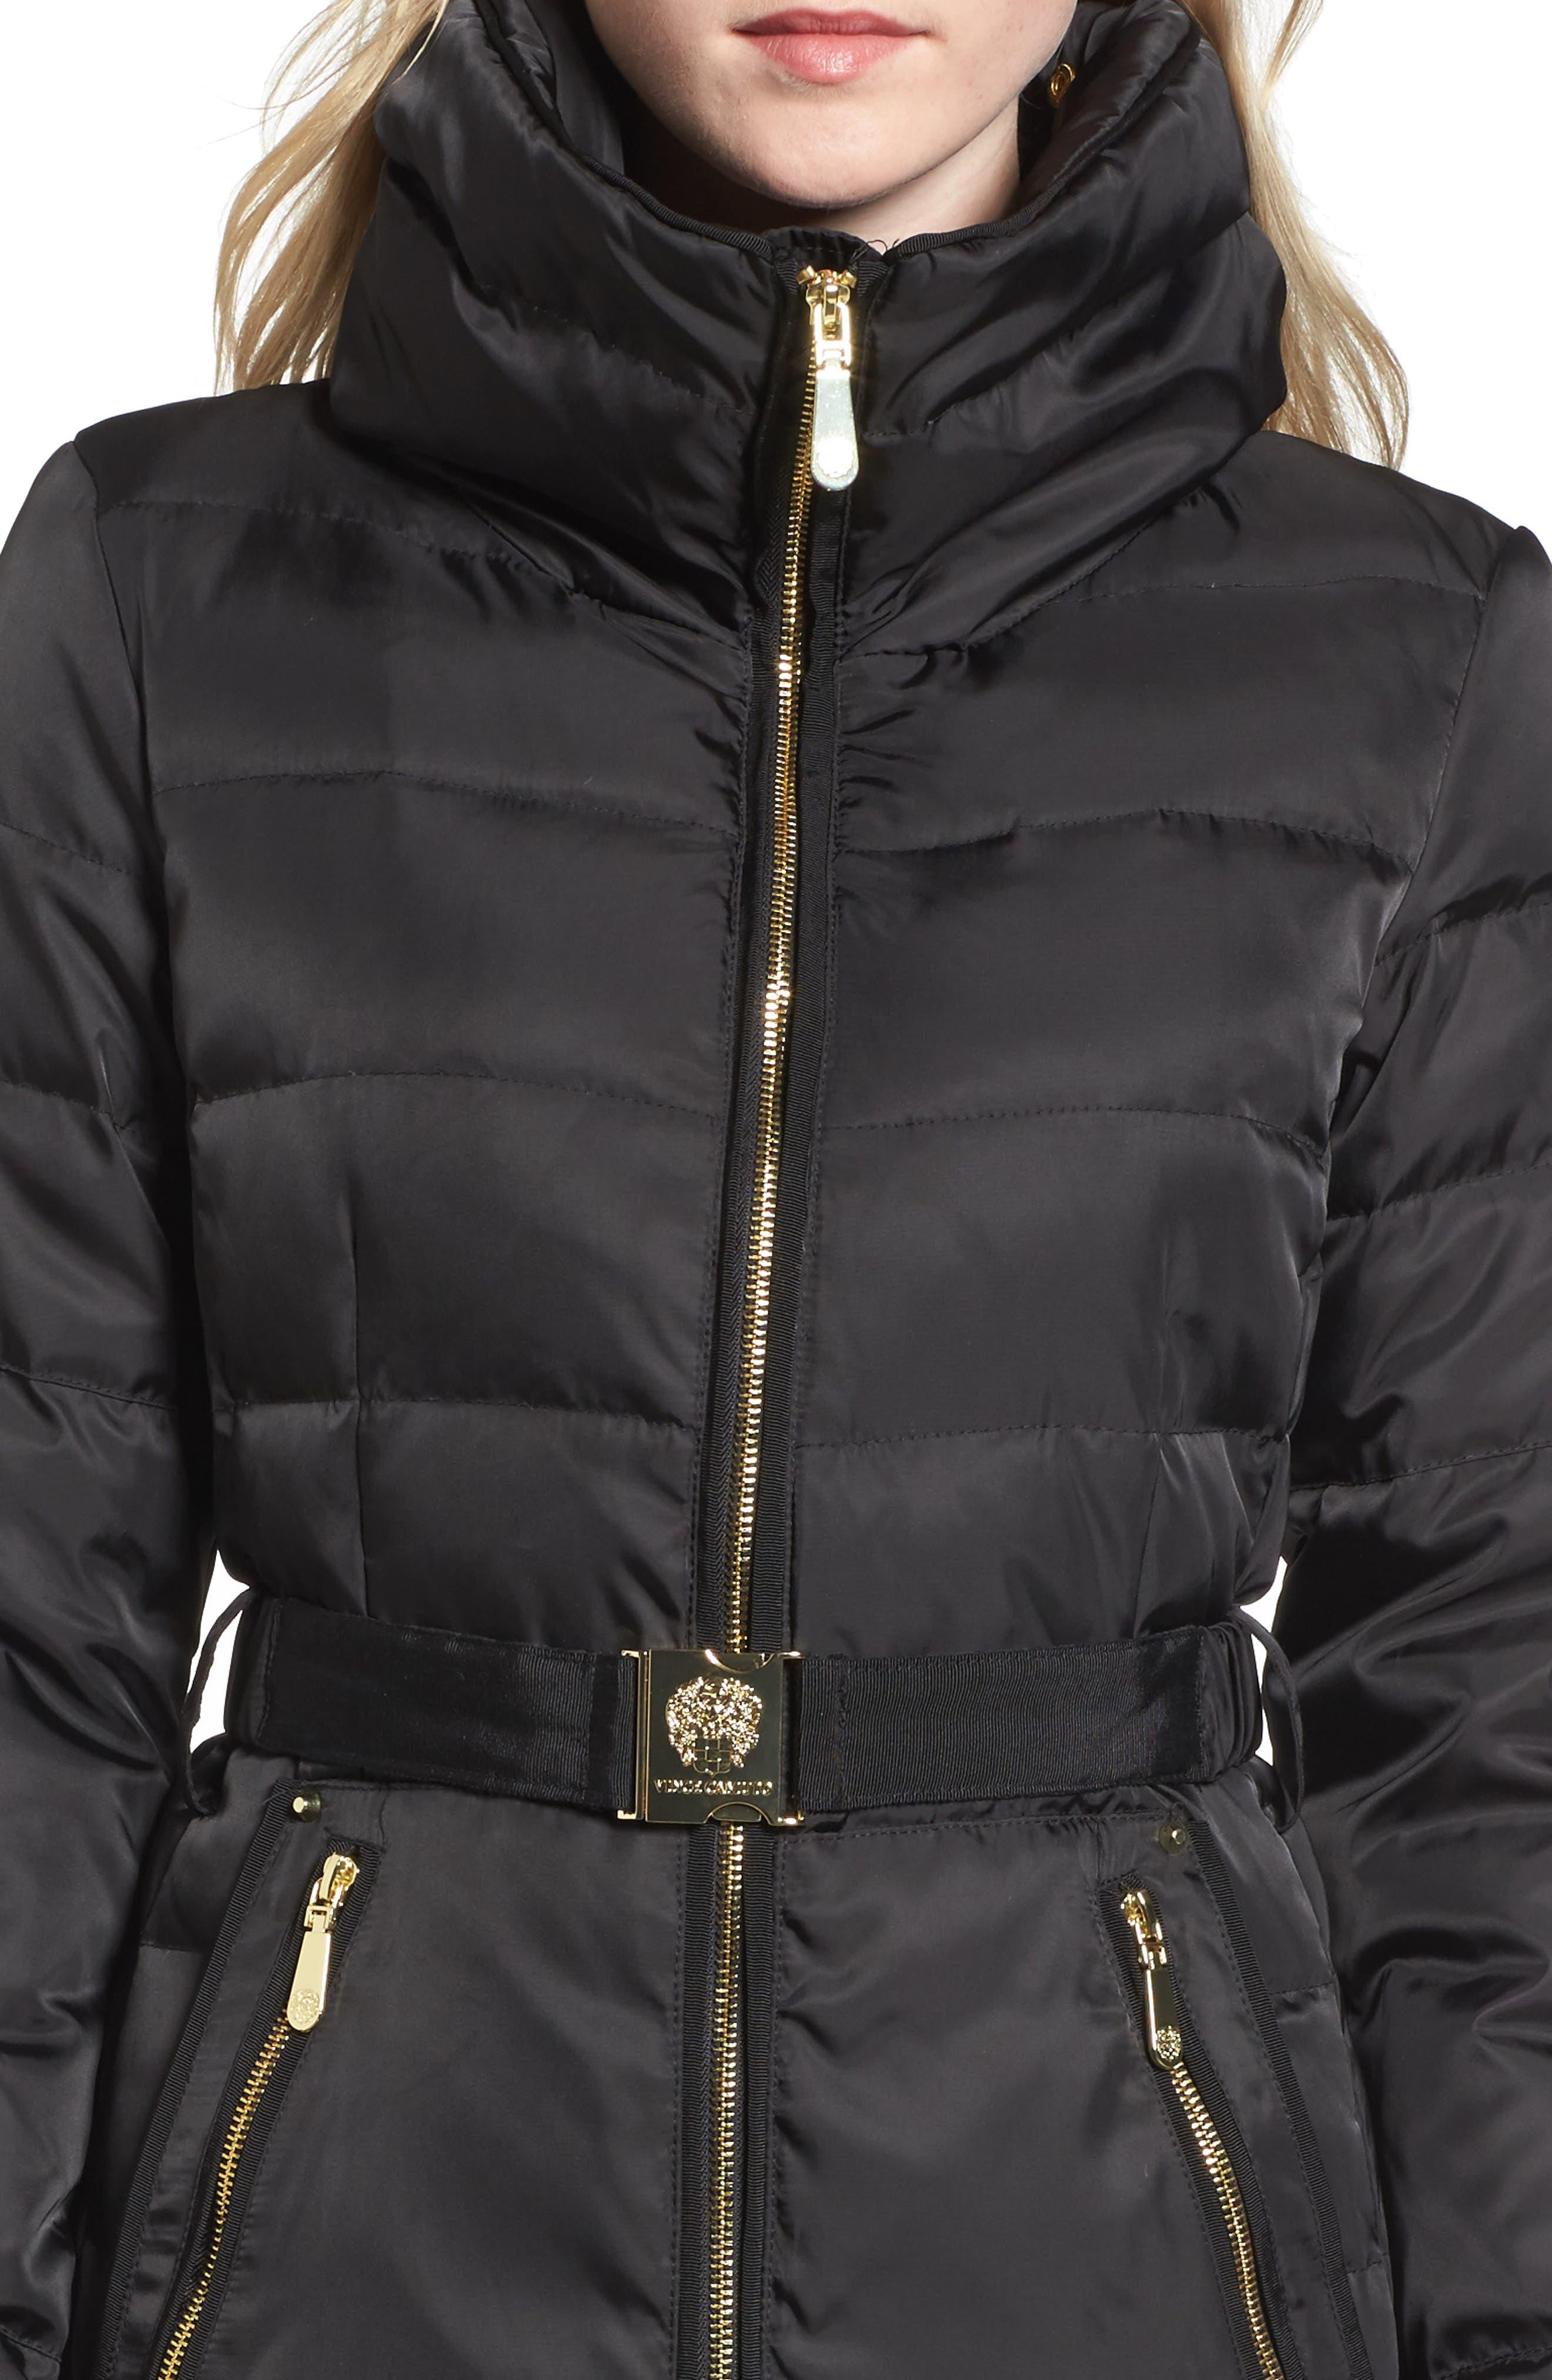 Belted Coat with Detachable Faux Fur,                             Alternate thumbnail 4, color,                             001